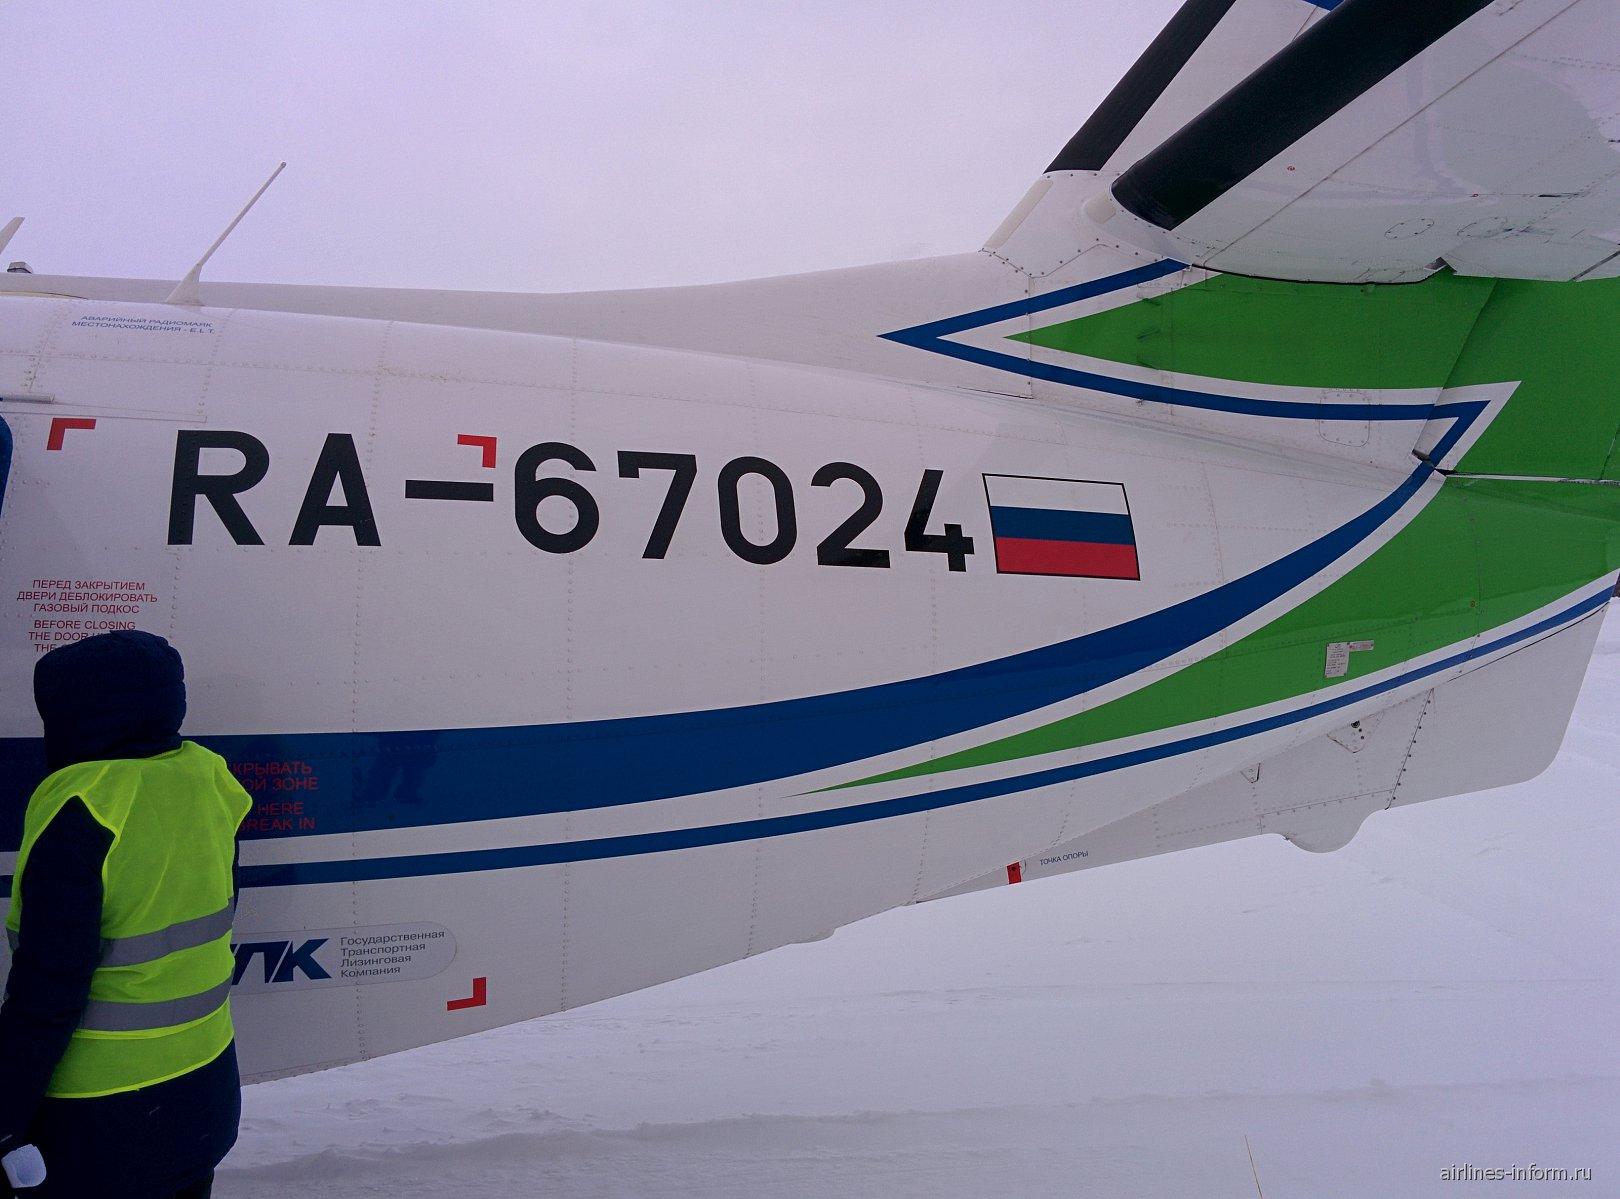 Самолет Л-410 авиакомпании